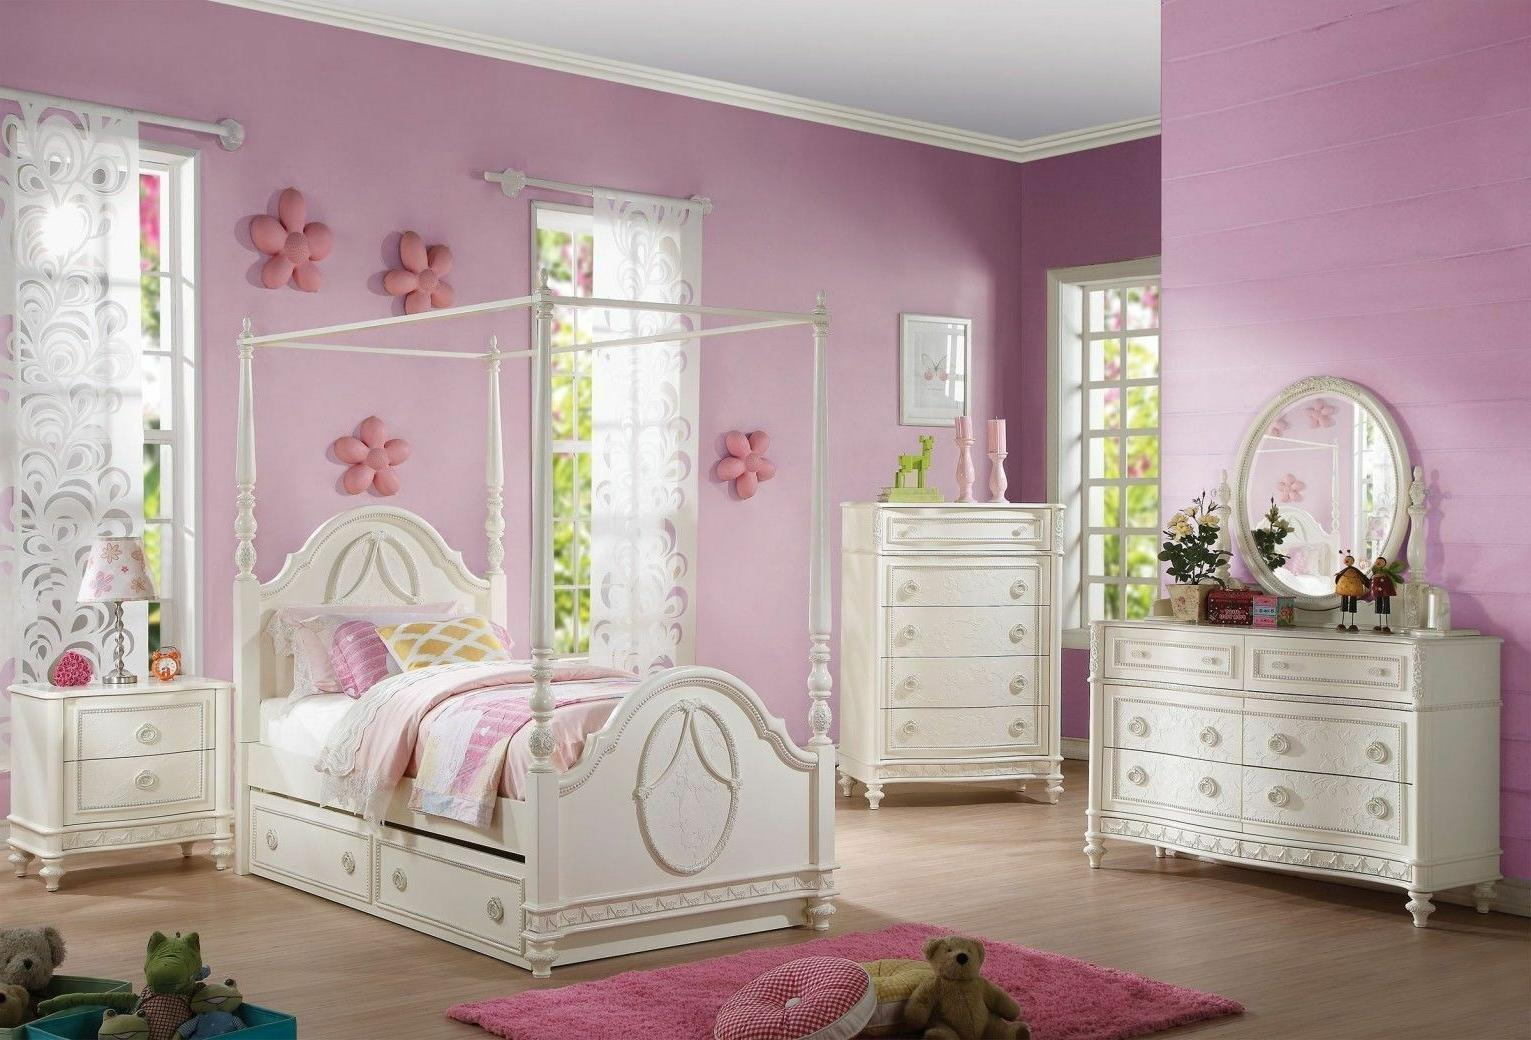 dorothy twin 4 piece canopy bedroom set